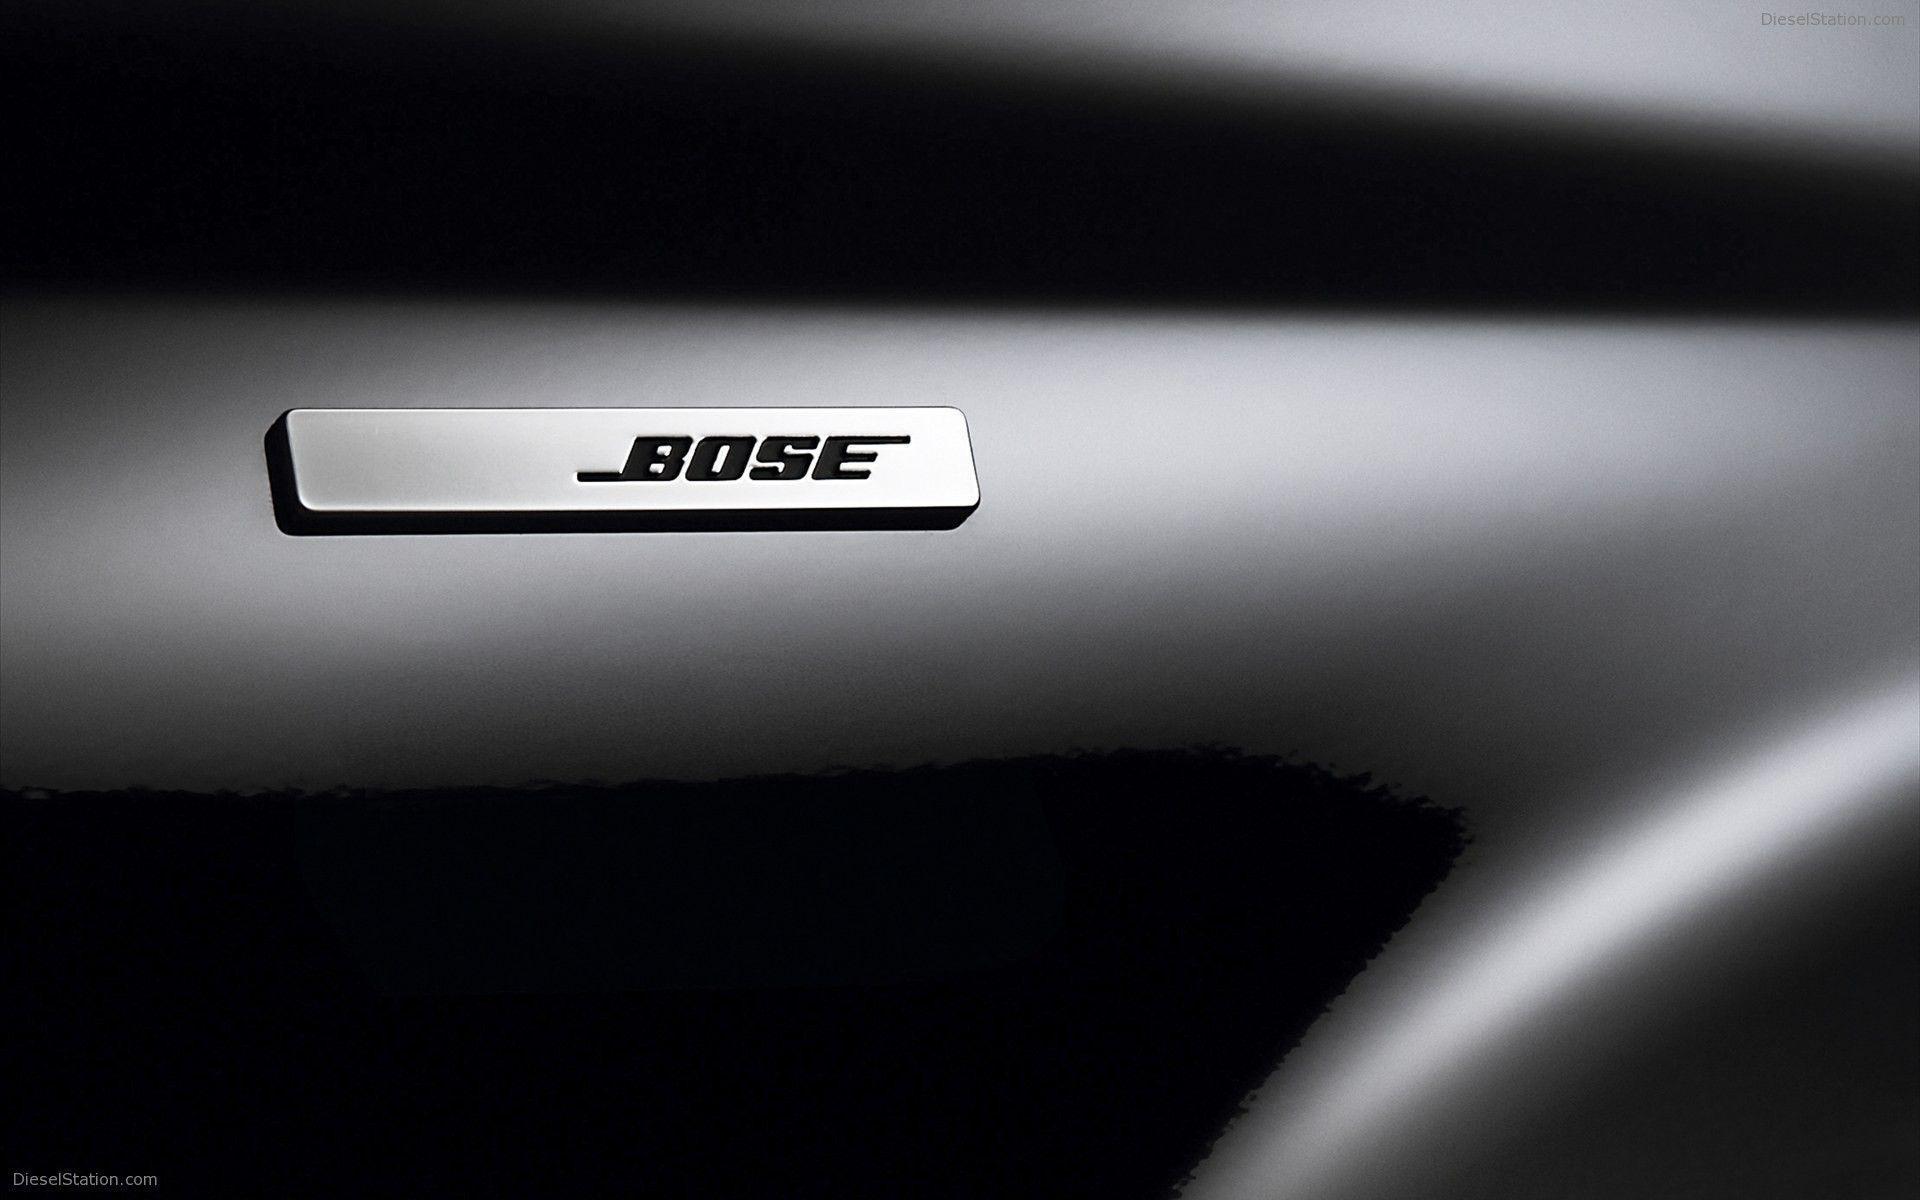 Bose 700 Soundbar - Test & Avis - Les Meilleures Enceintes Avis.fr